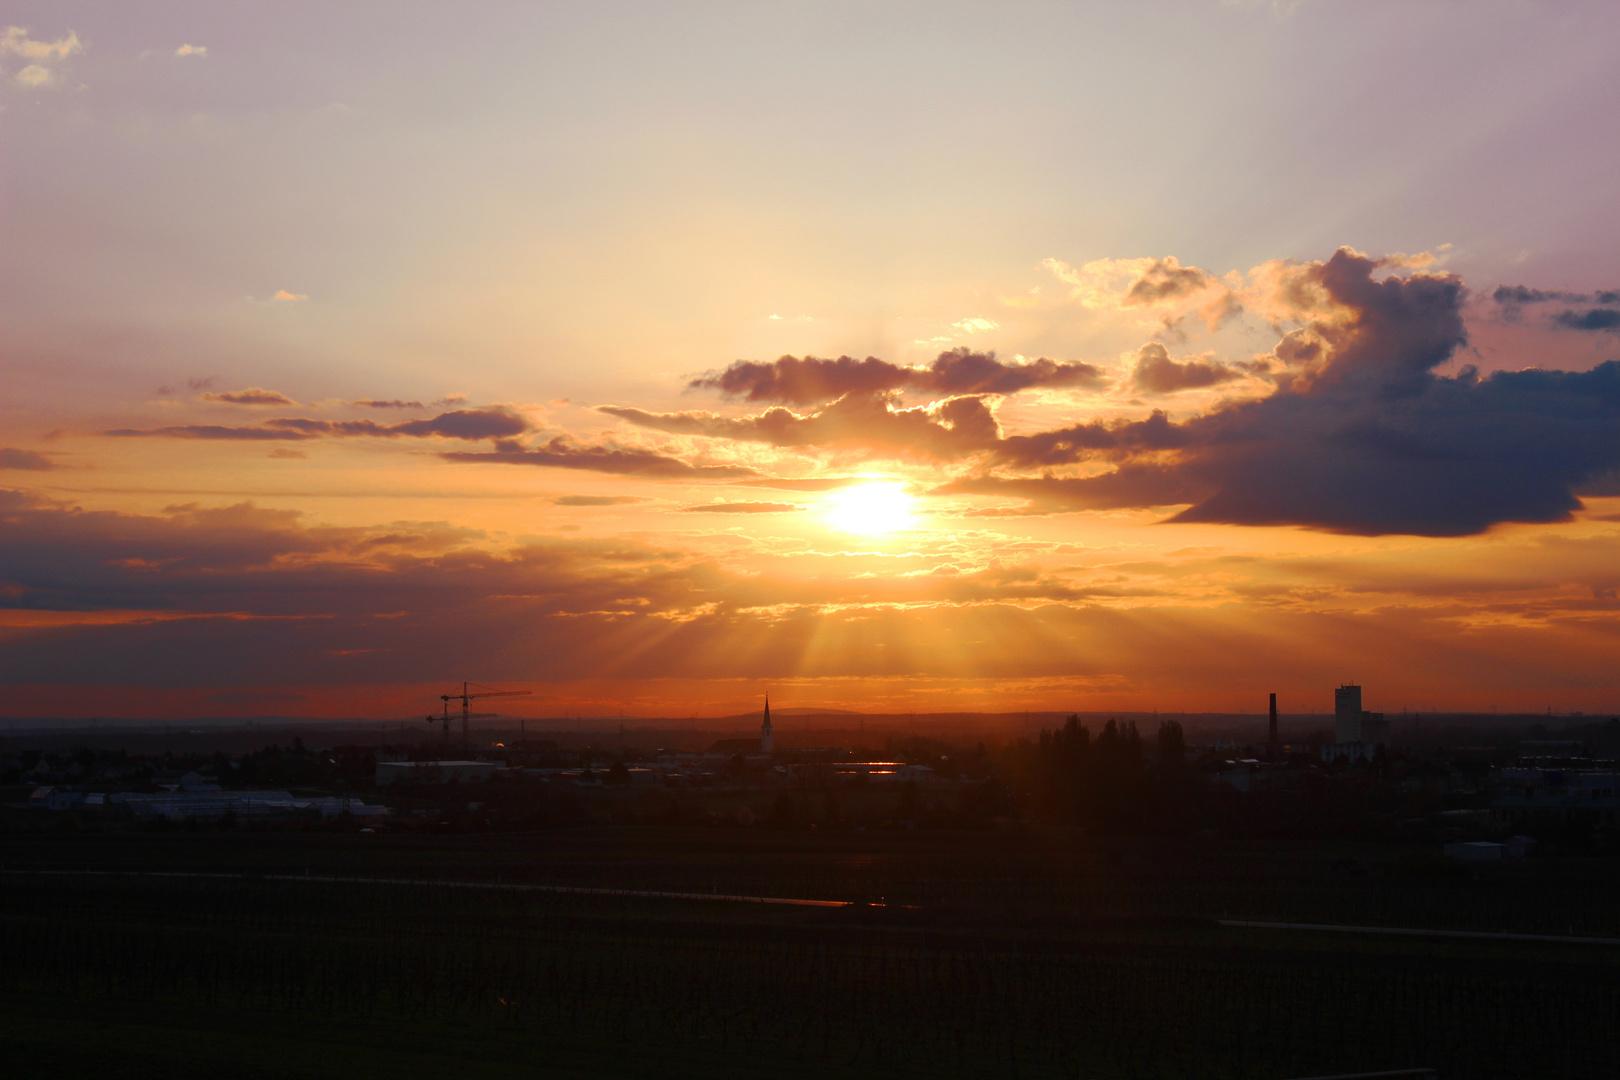 Sonnenaufgang *__*